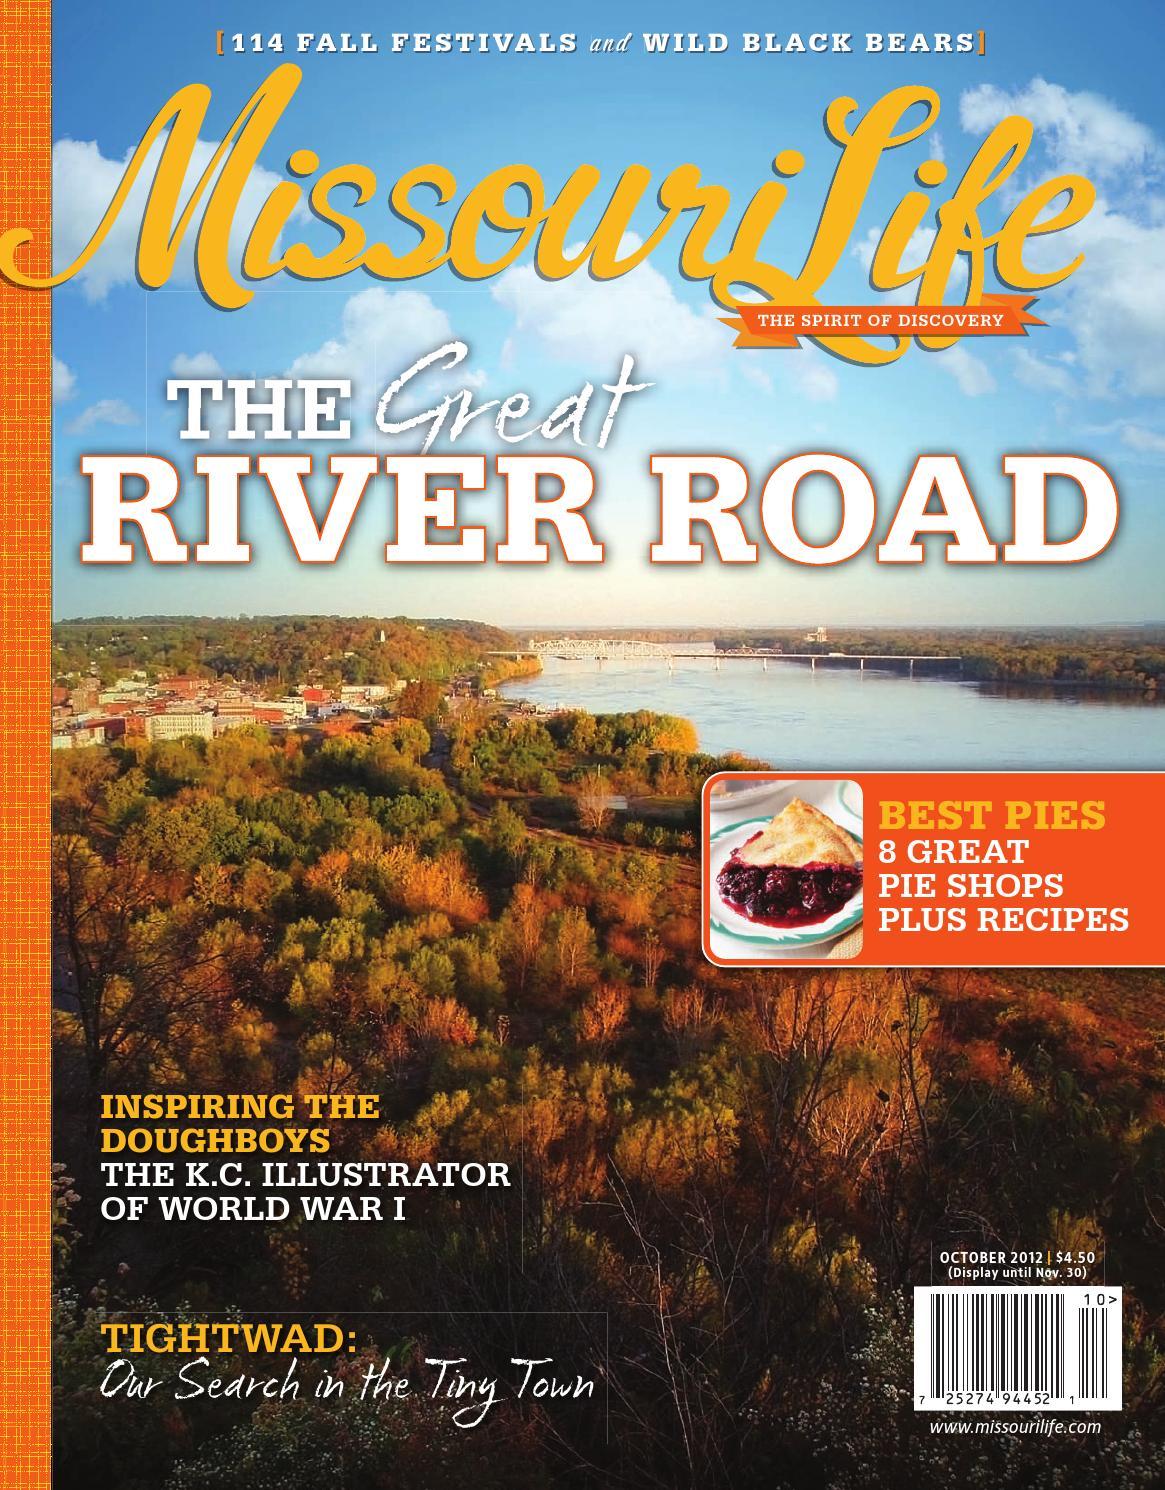 Missouri Life October/November 2012 by Missouri Life Magazine - issuu